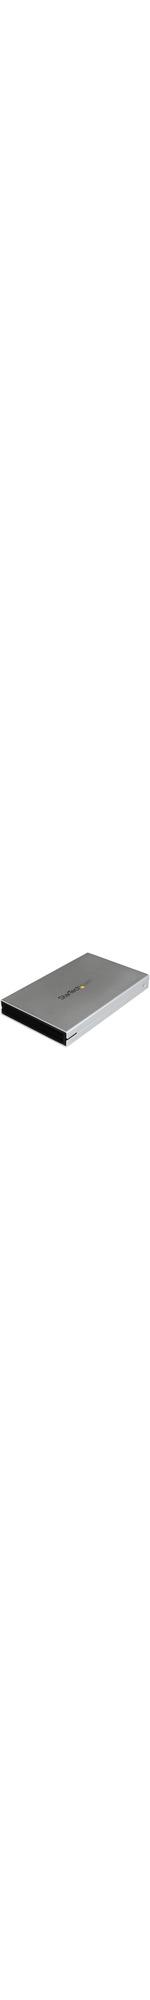 StarTech.com eSATAp / eSATA or USB 3.0 External 2.5in SATA III 6 Gbps Hard Drive Enclosure with UASP